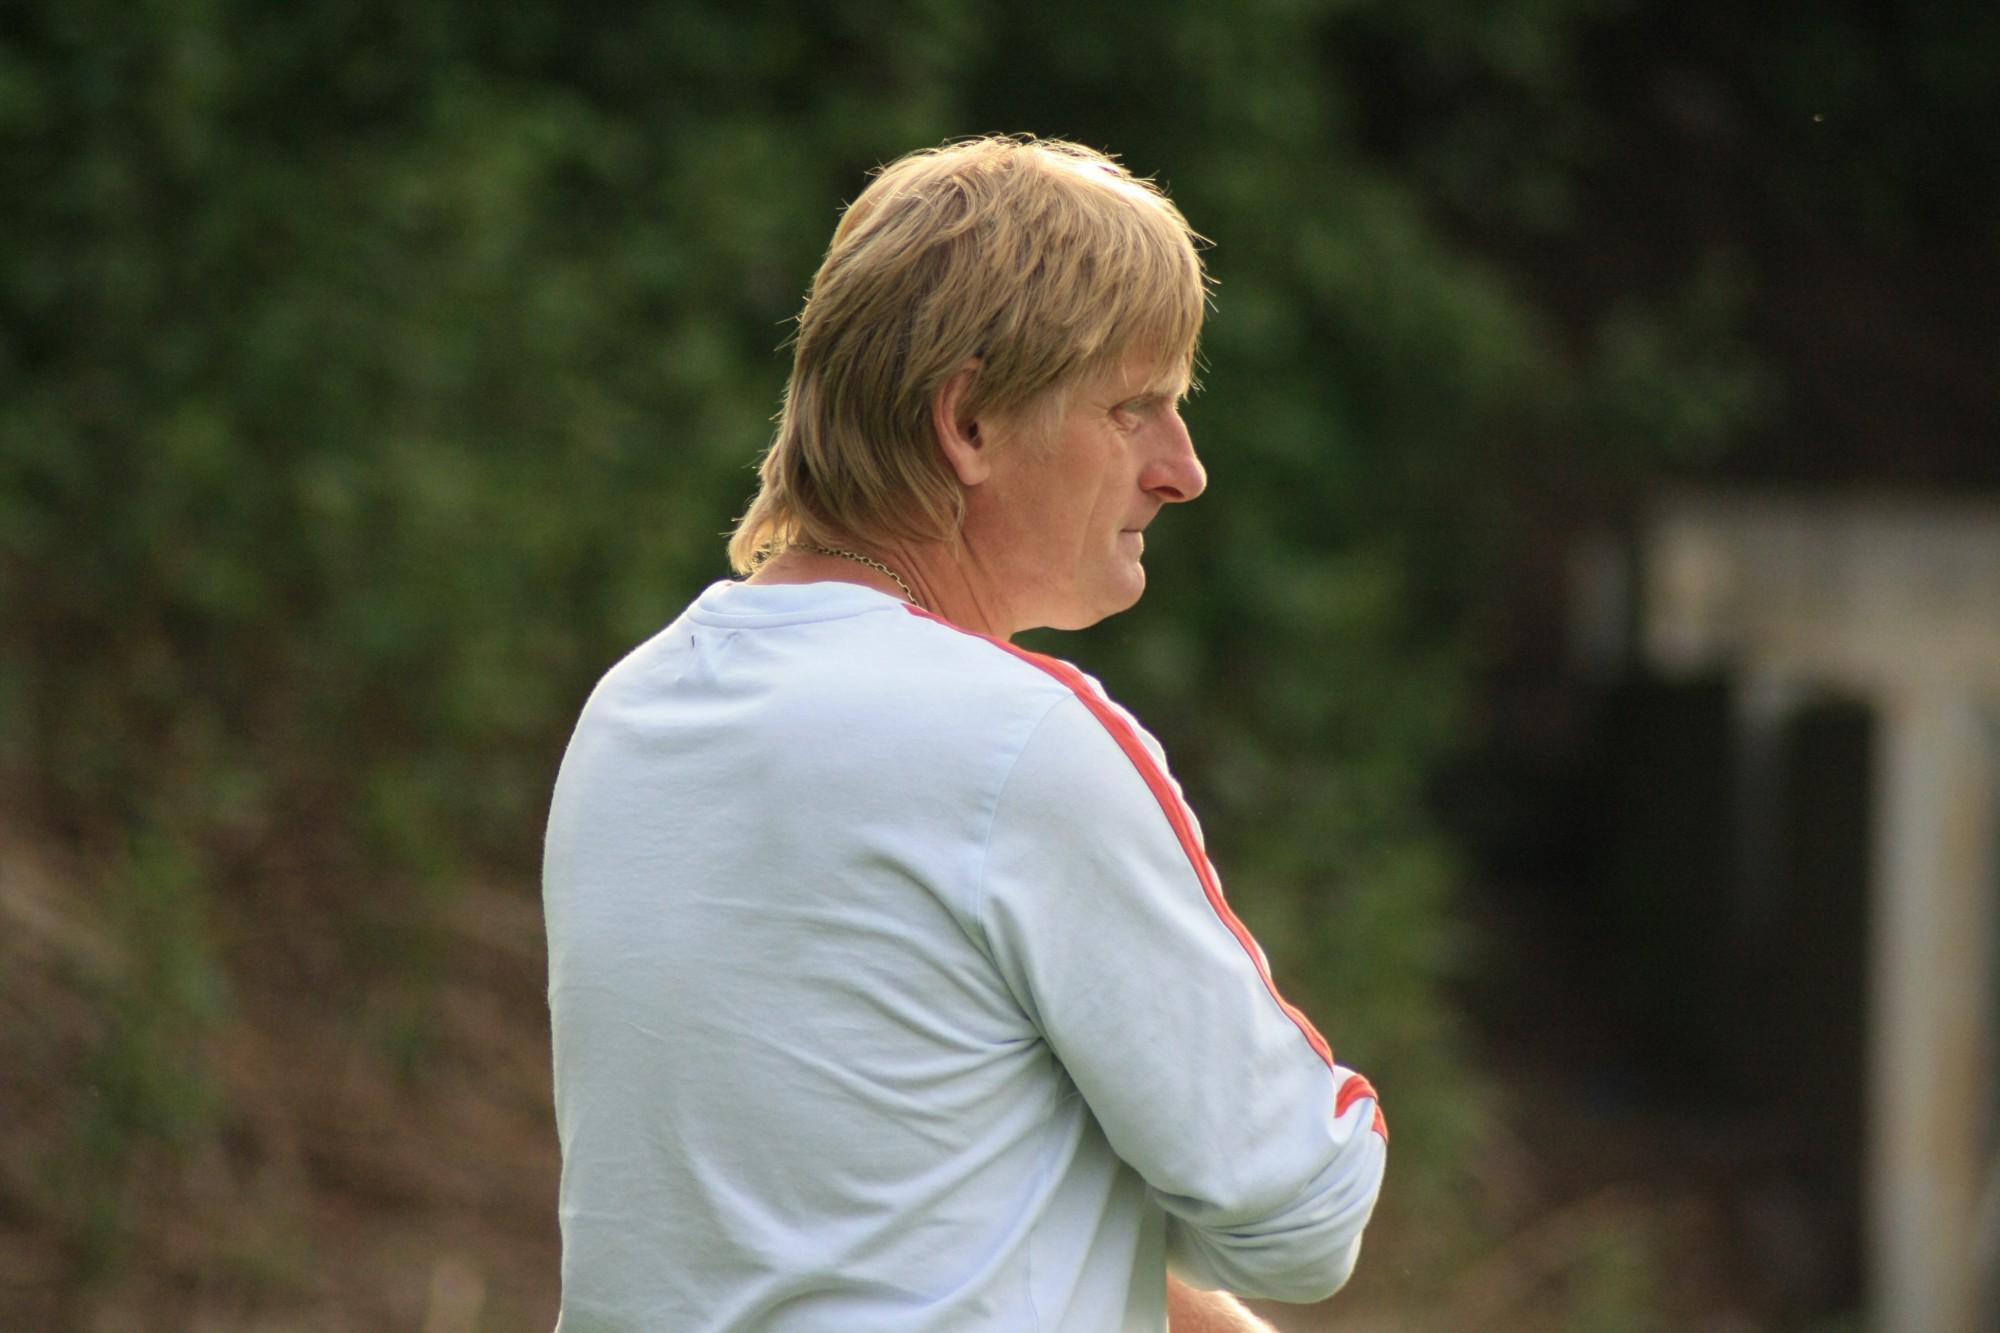 Michal Štancl